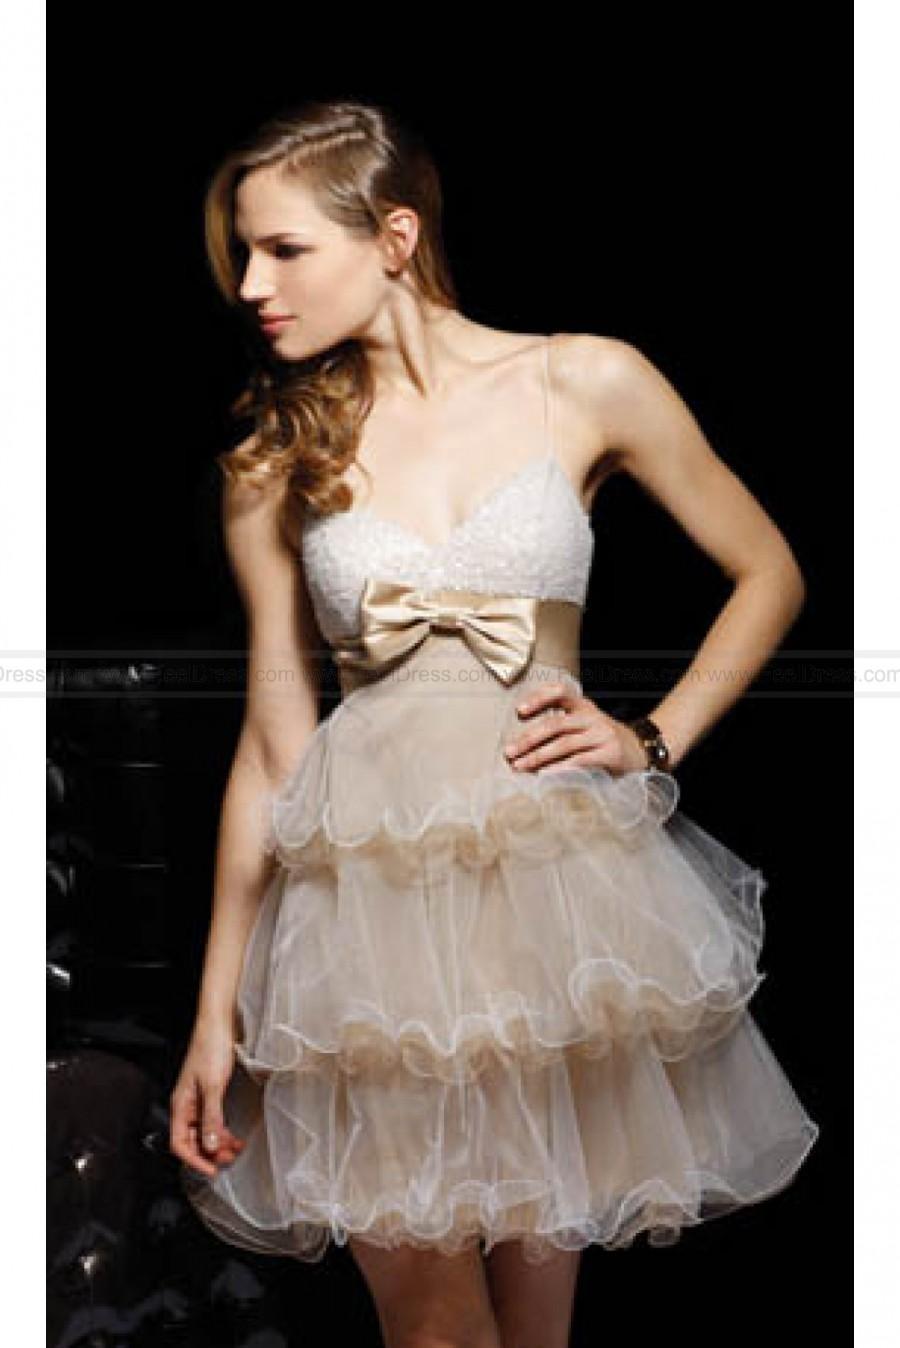 زفاف - Spaghetti Straps Layered Cocktail Dress